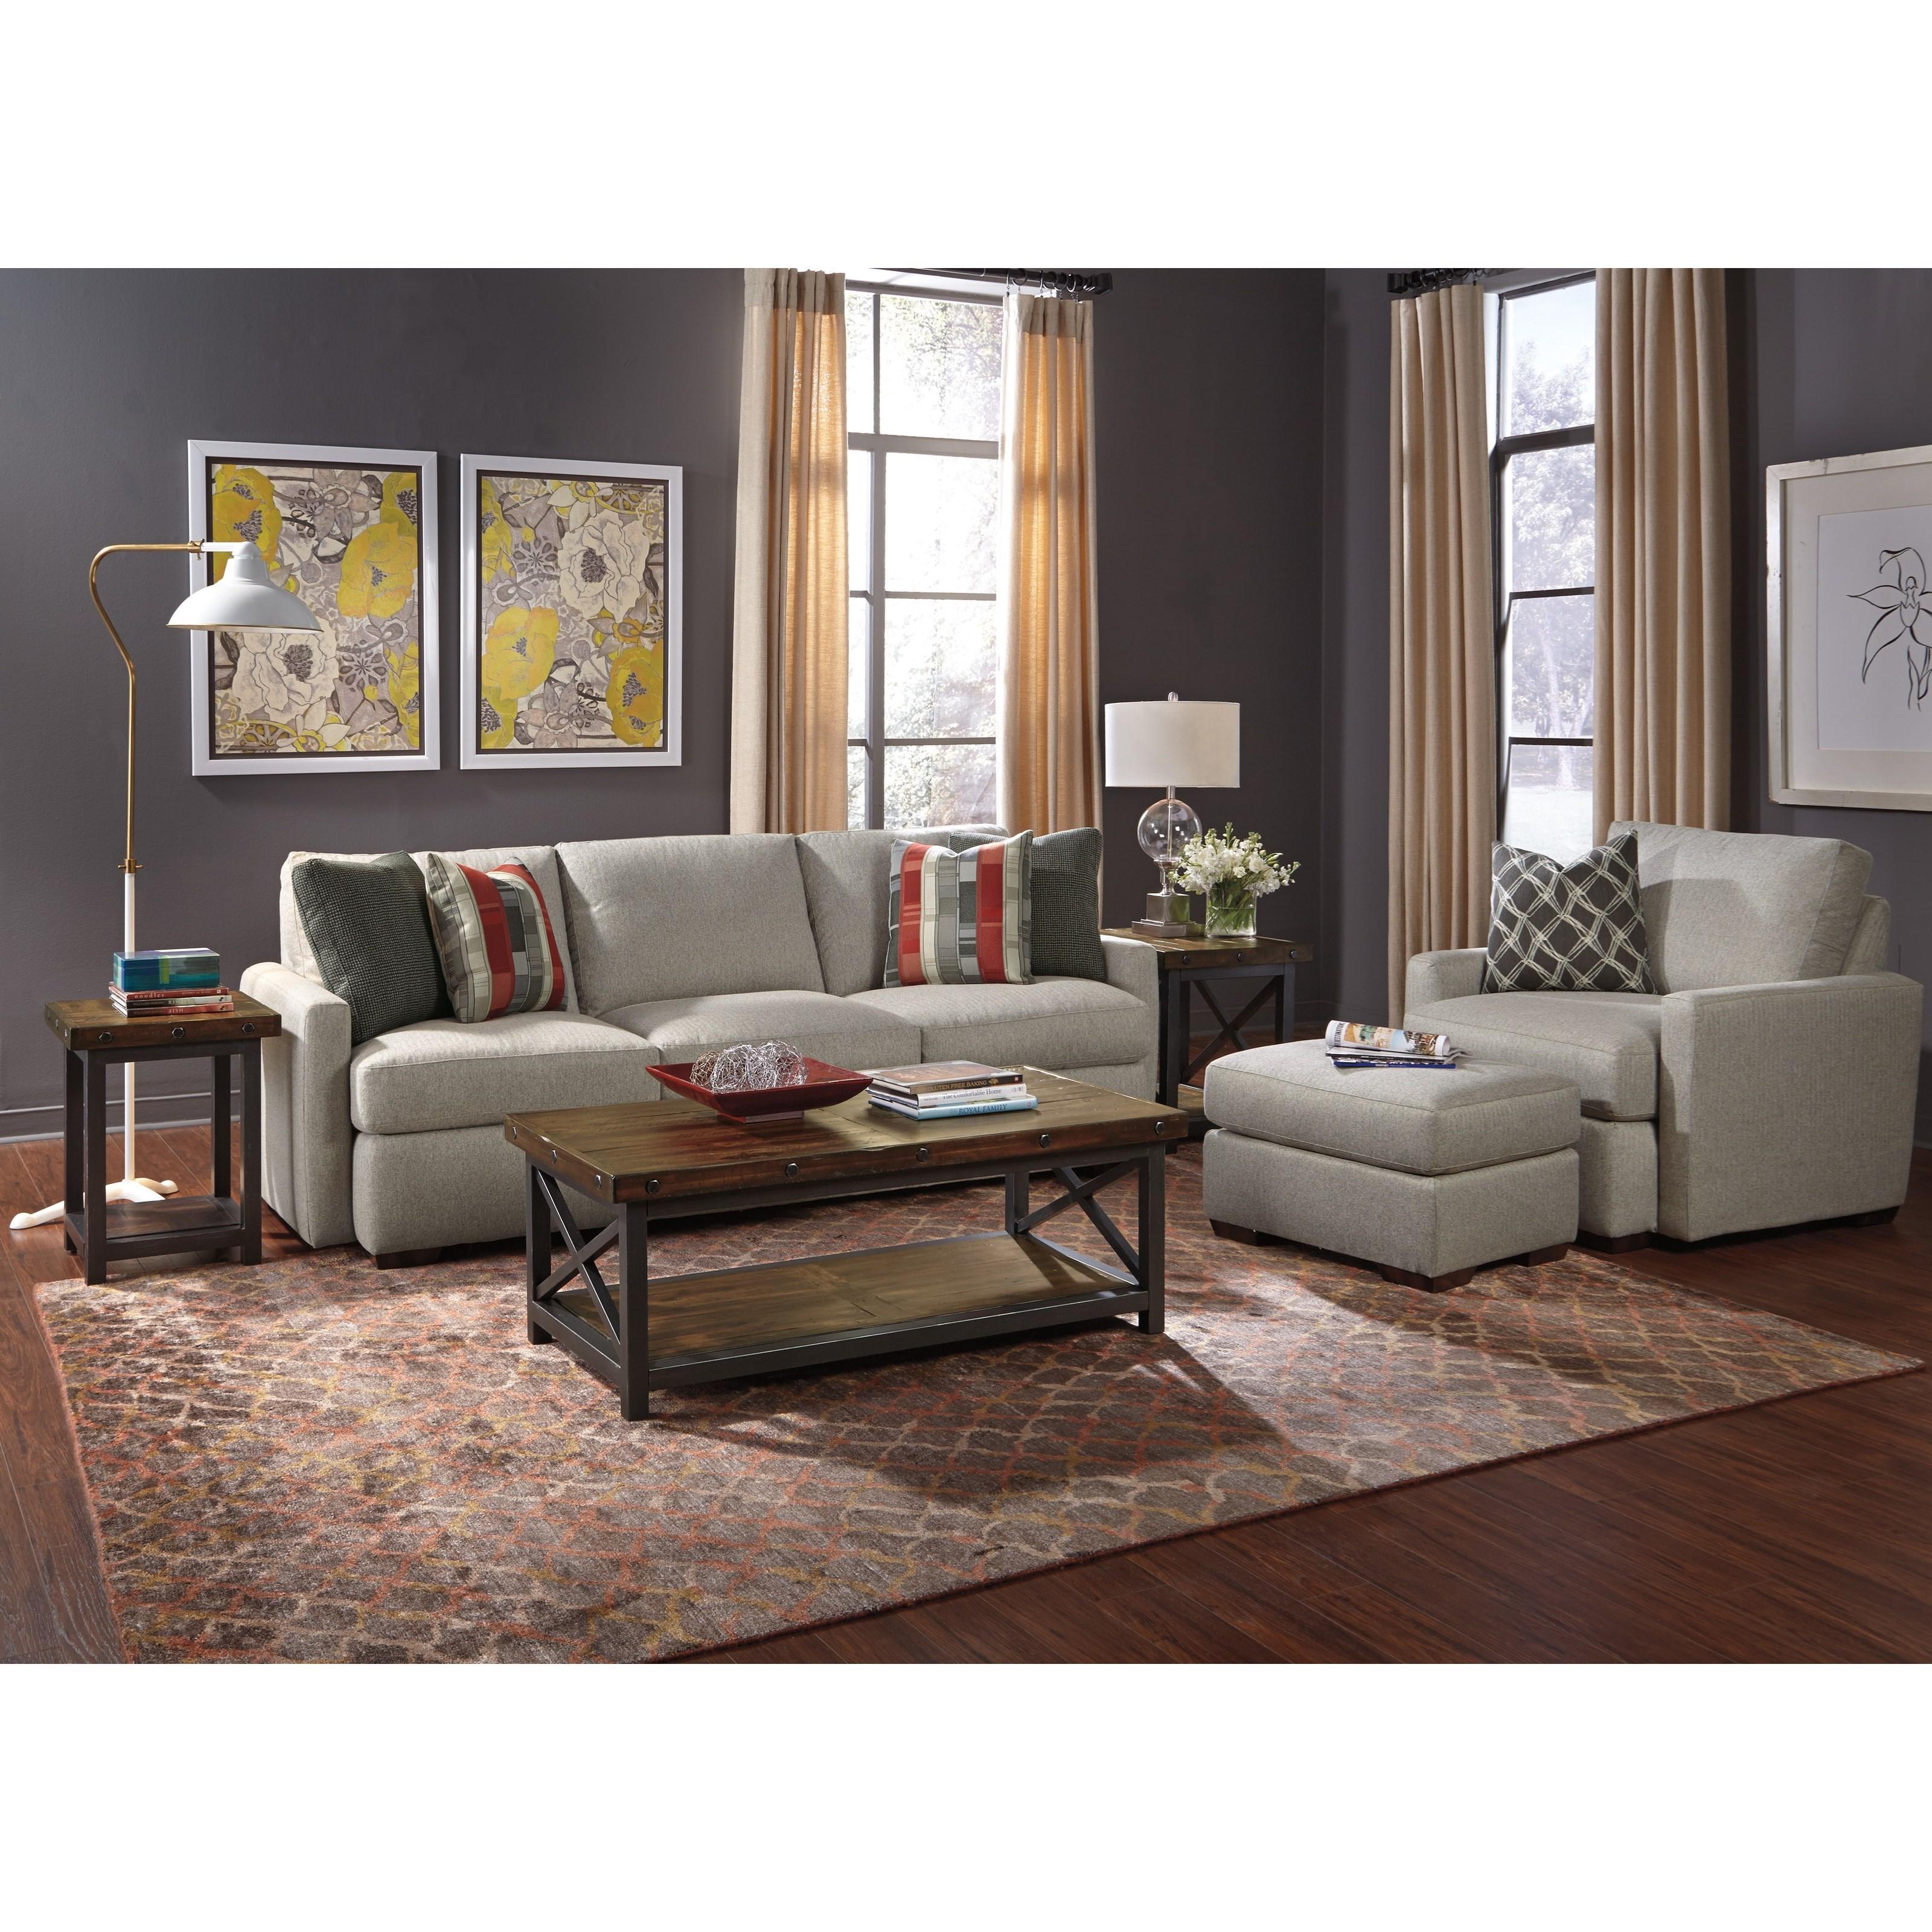 Flexsteel Michelle Living Room Group - Item Number: 7906 Living Room Group 1